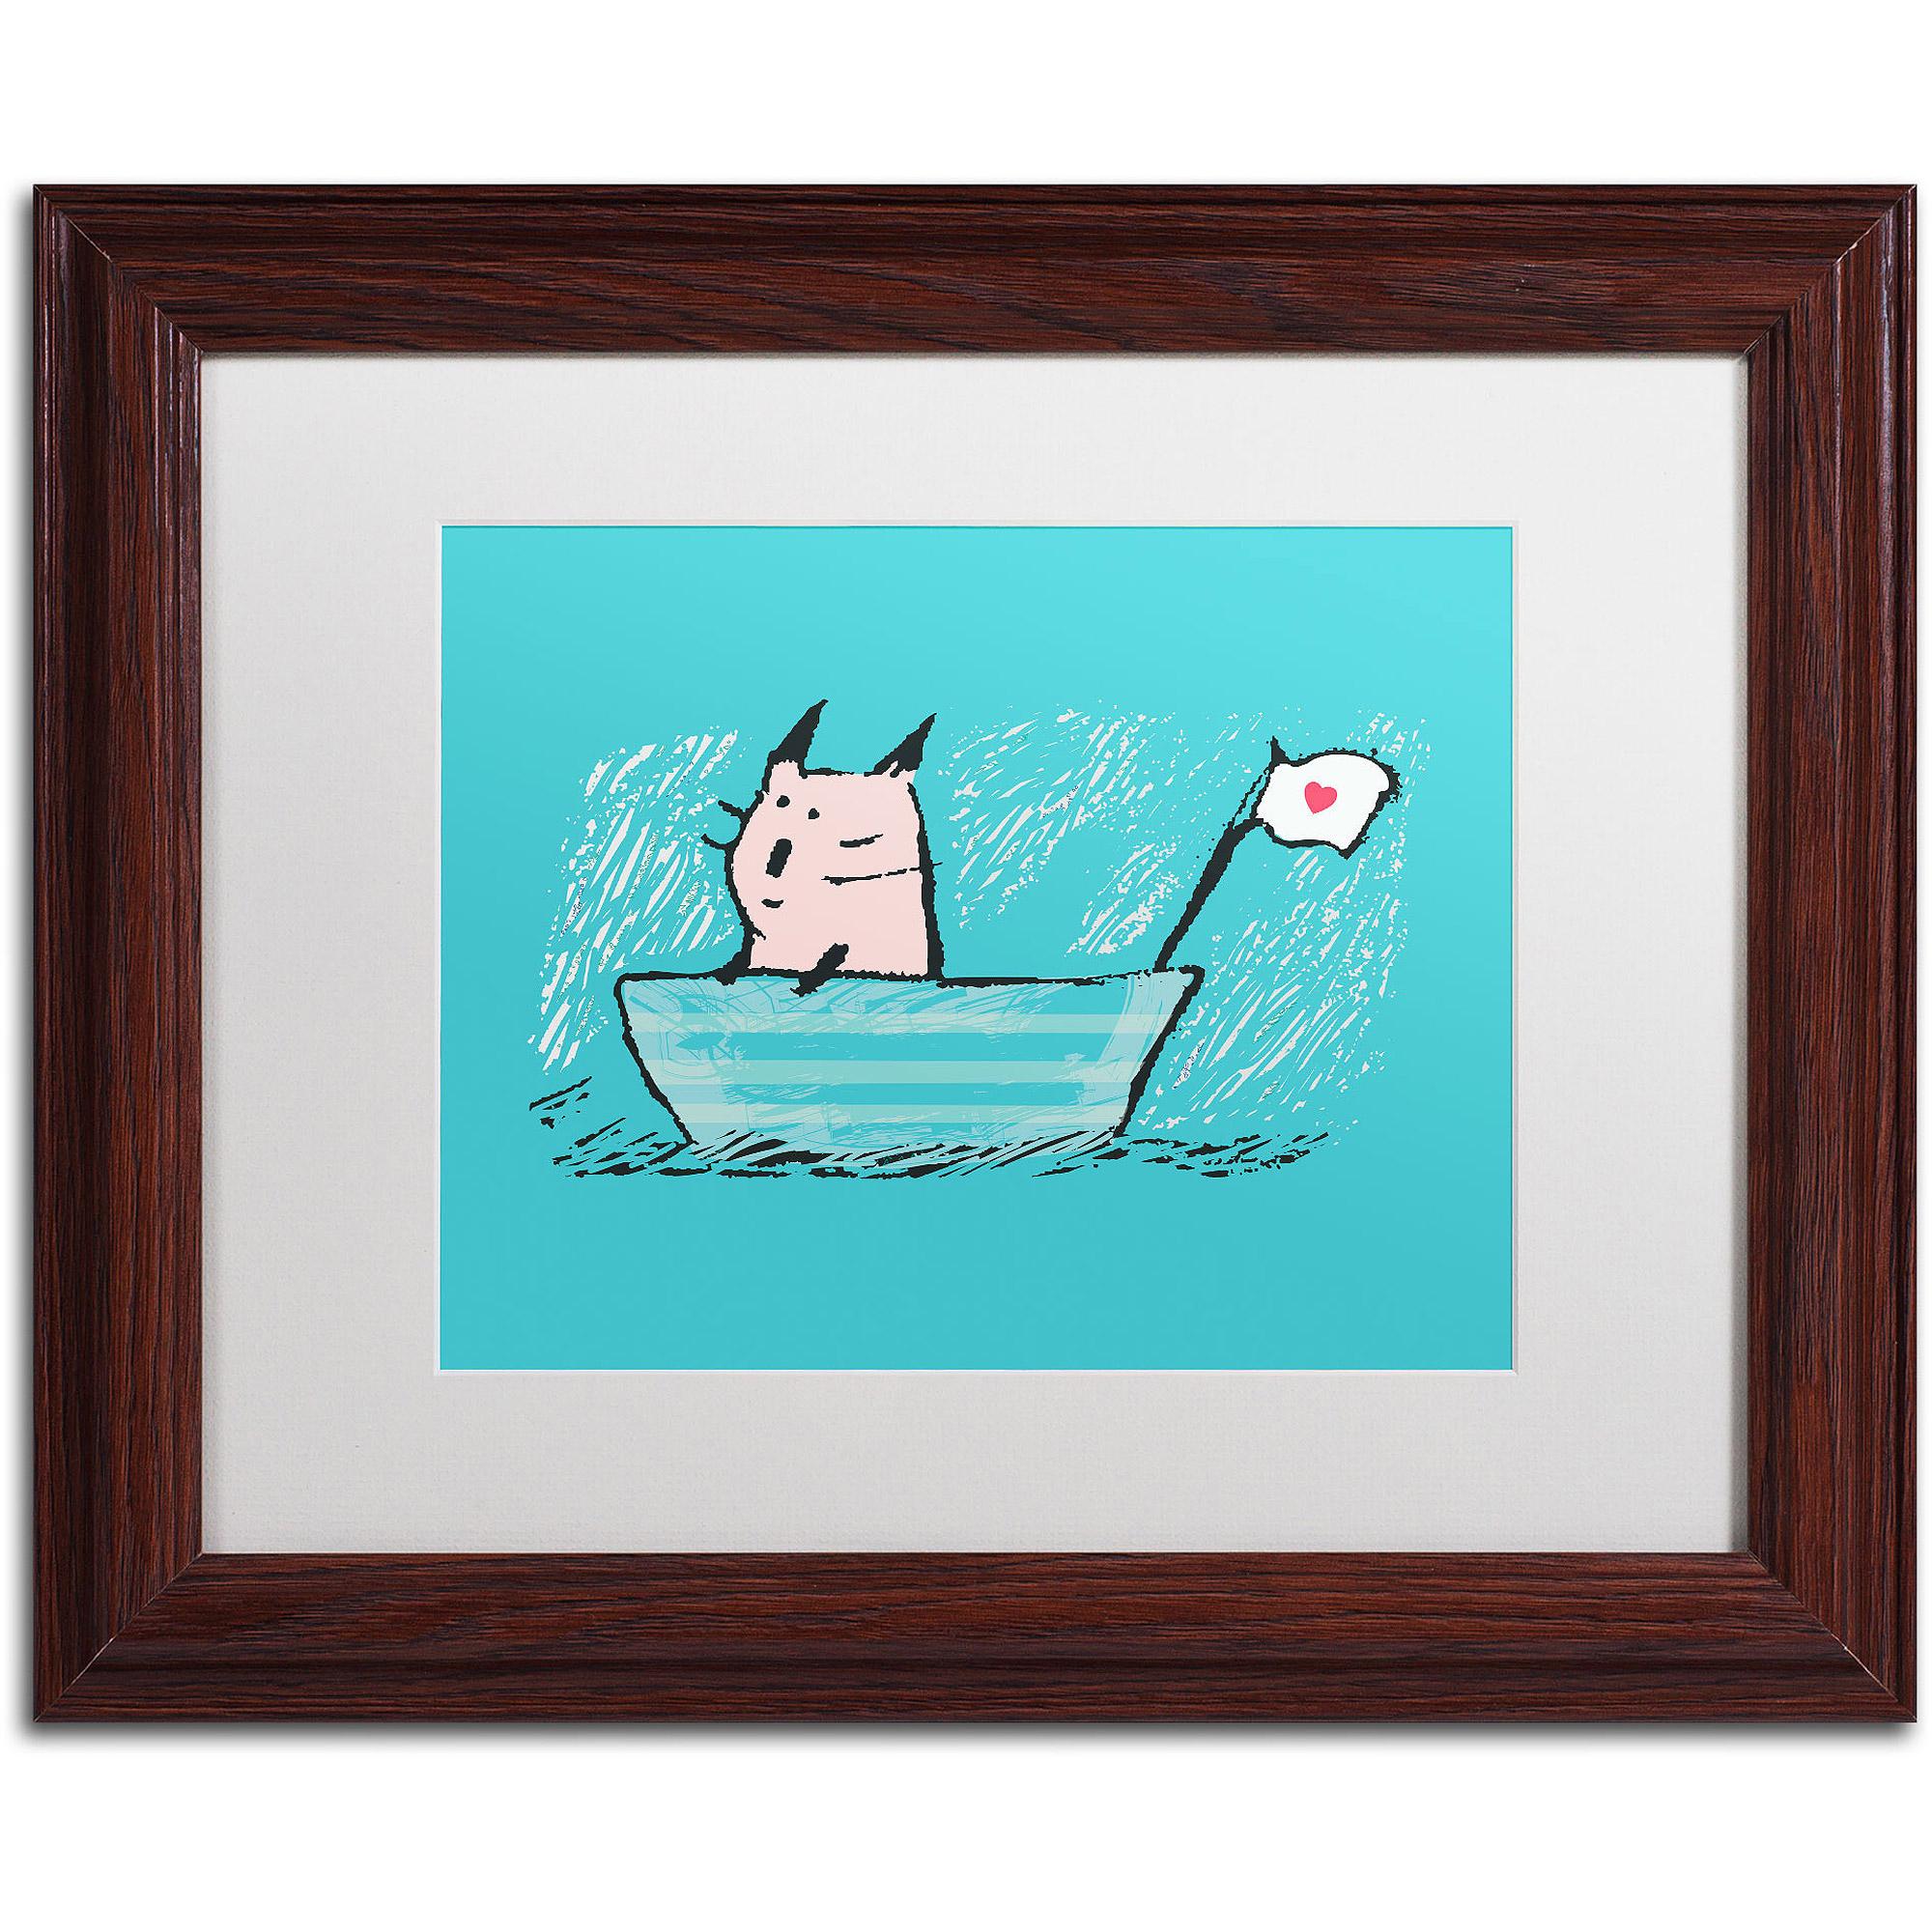 "Trademark Fine Art ""Sweet Sailor Cat"" Canvas Art by Carla Martell, White Matte, Wood Frame"